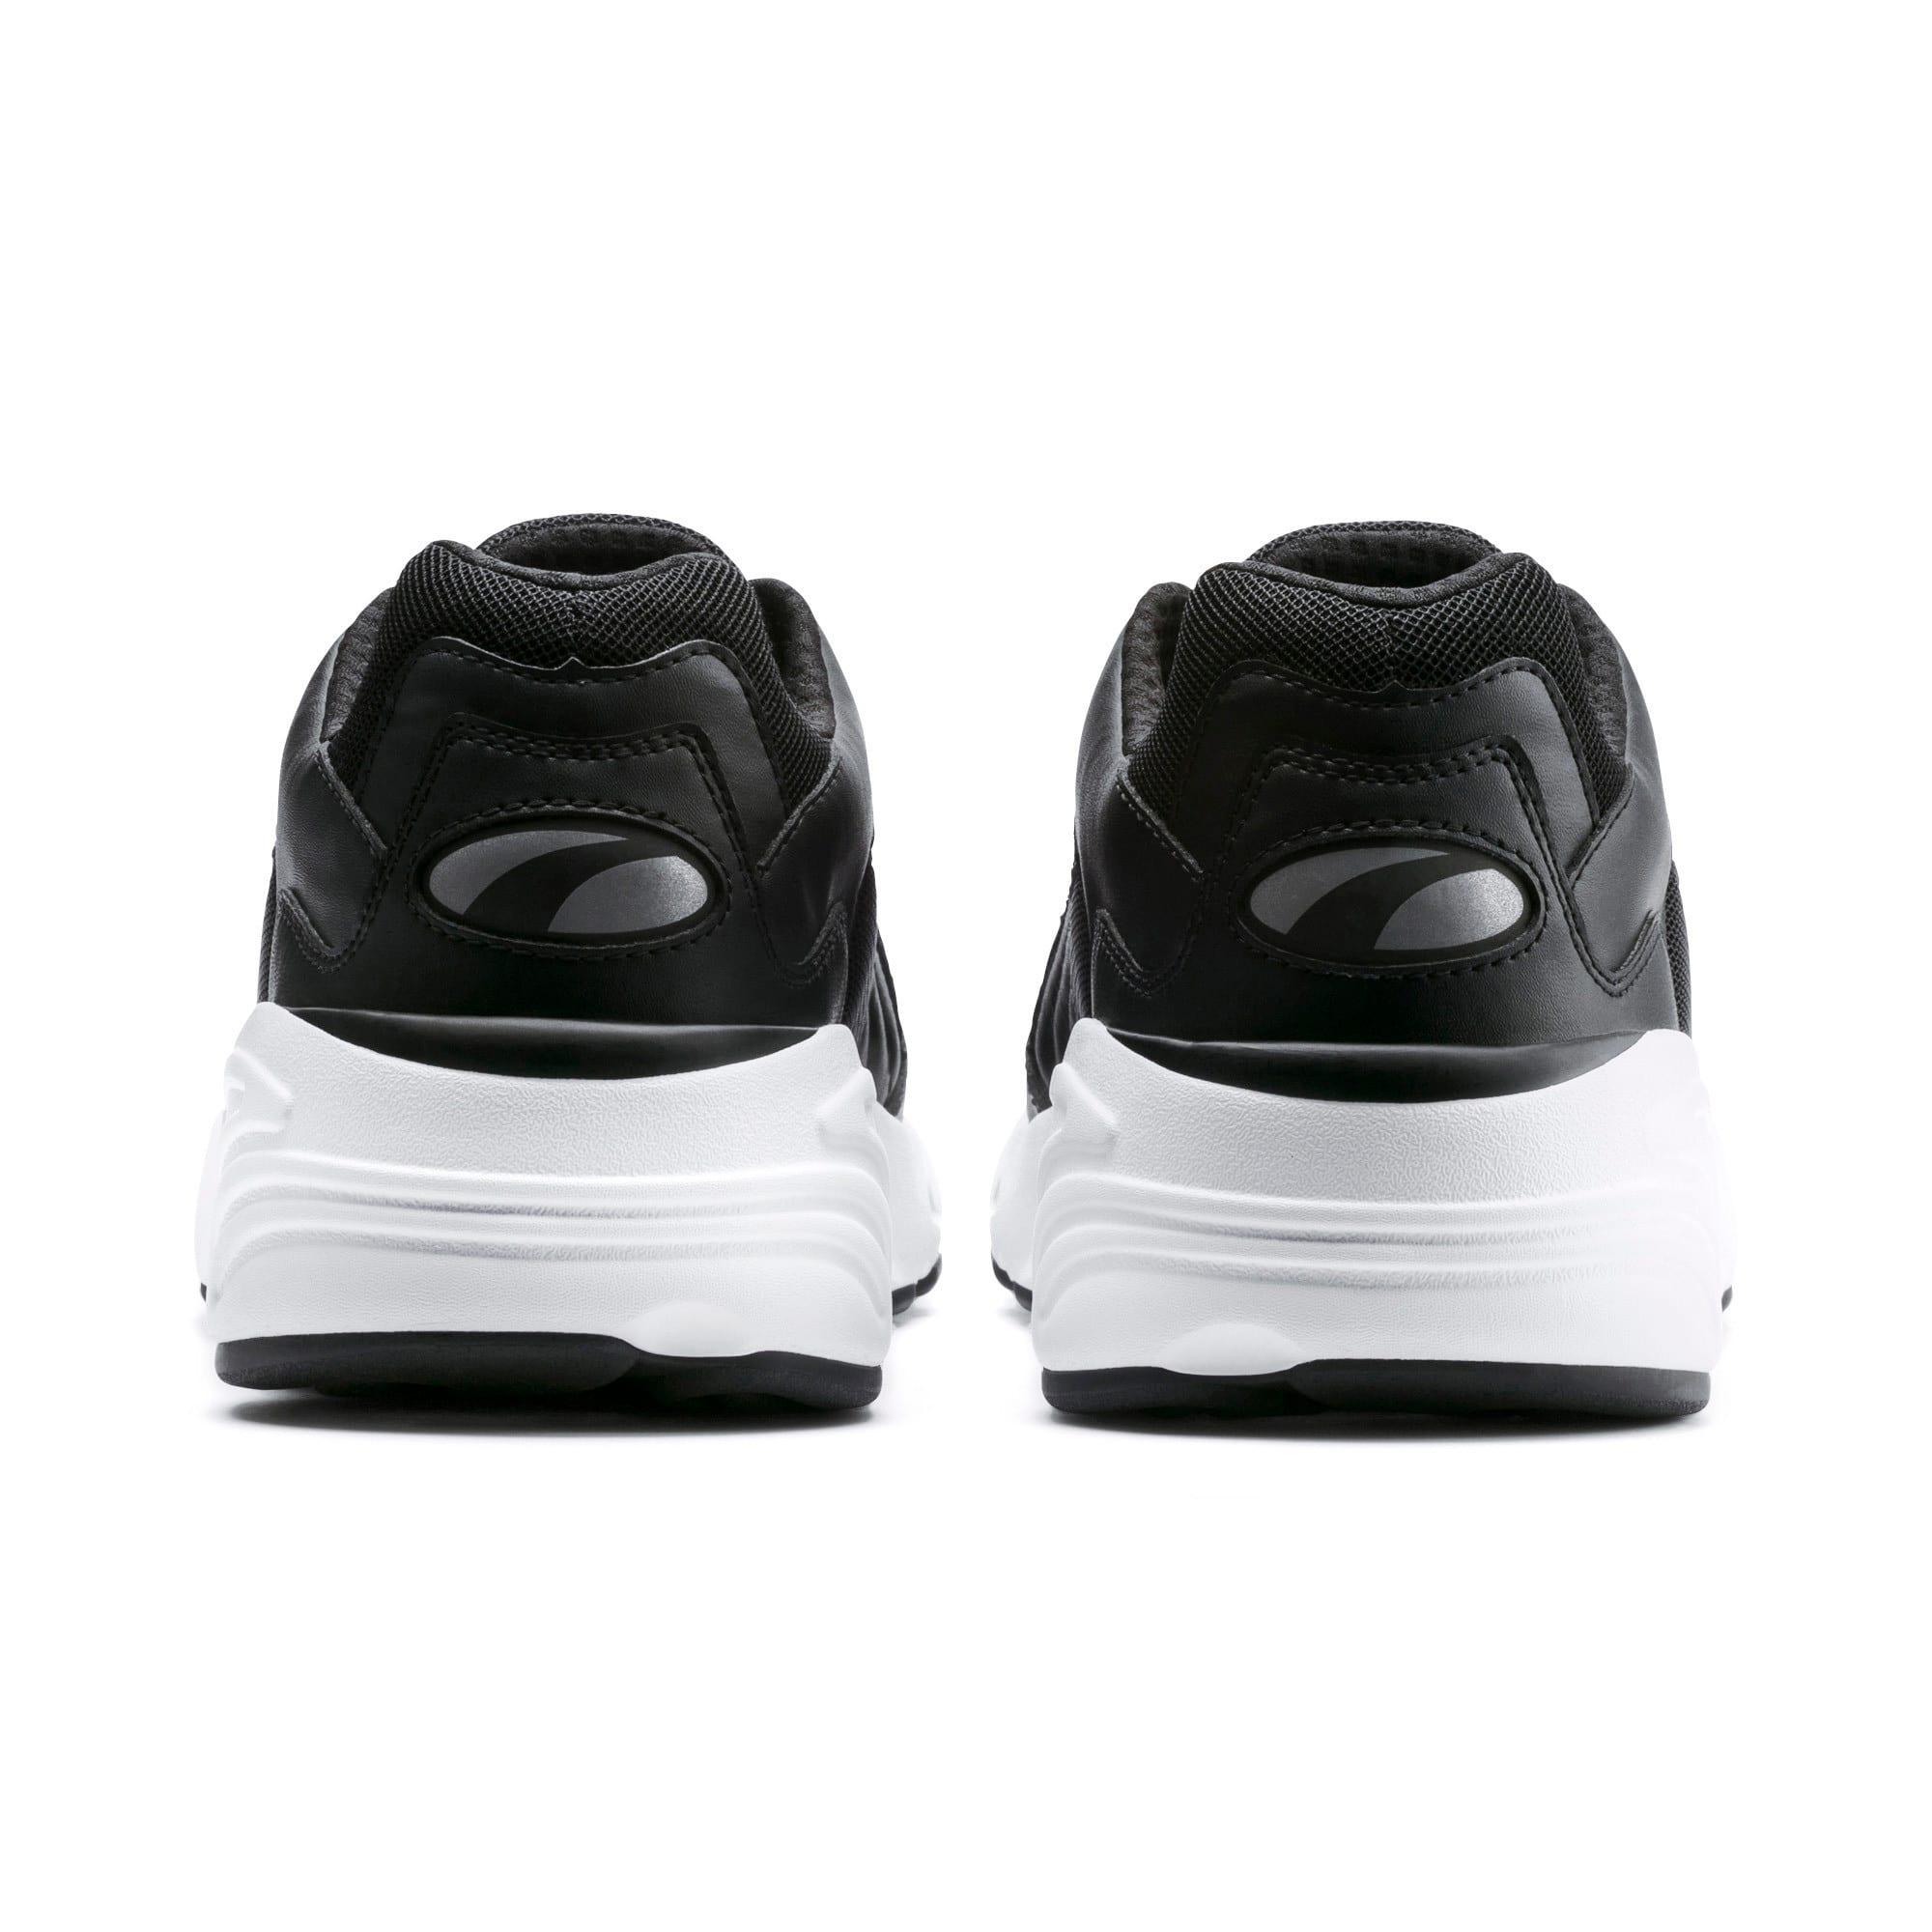 Thumbnail 3 of CELL Viper Sneakers, Puma Black-Puma White, medium